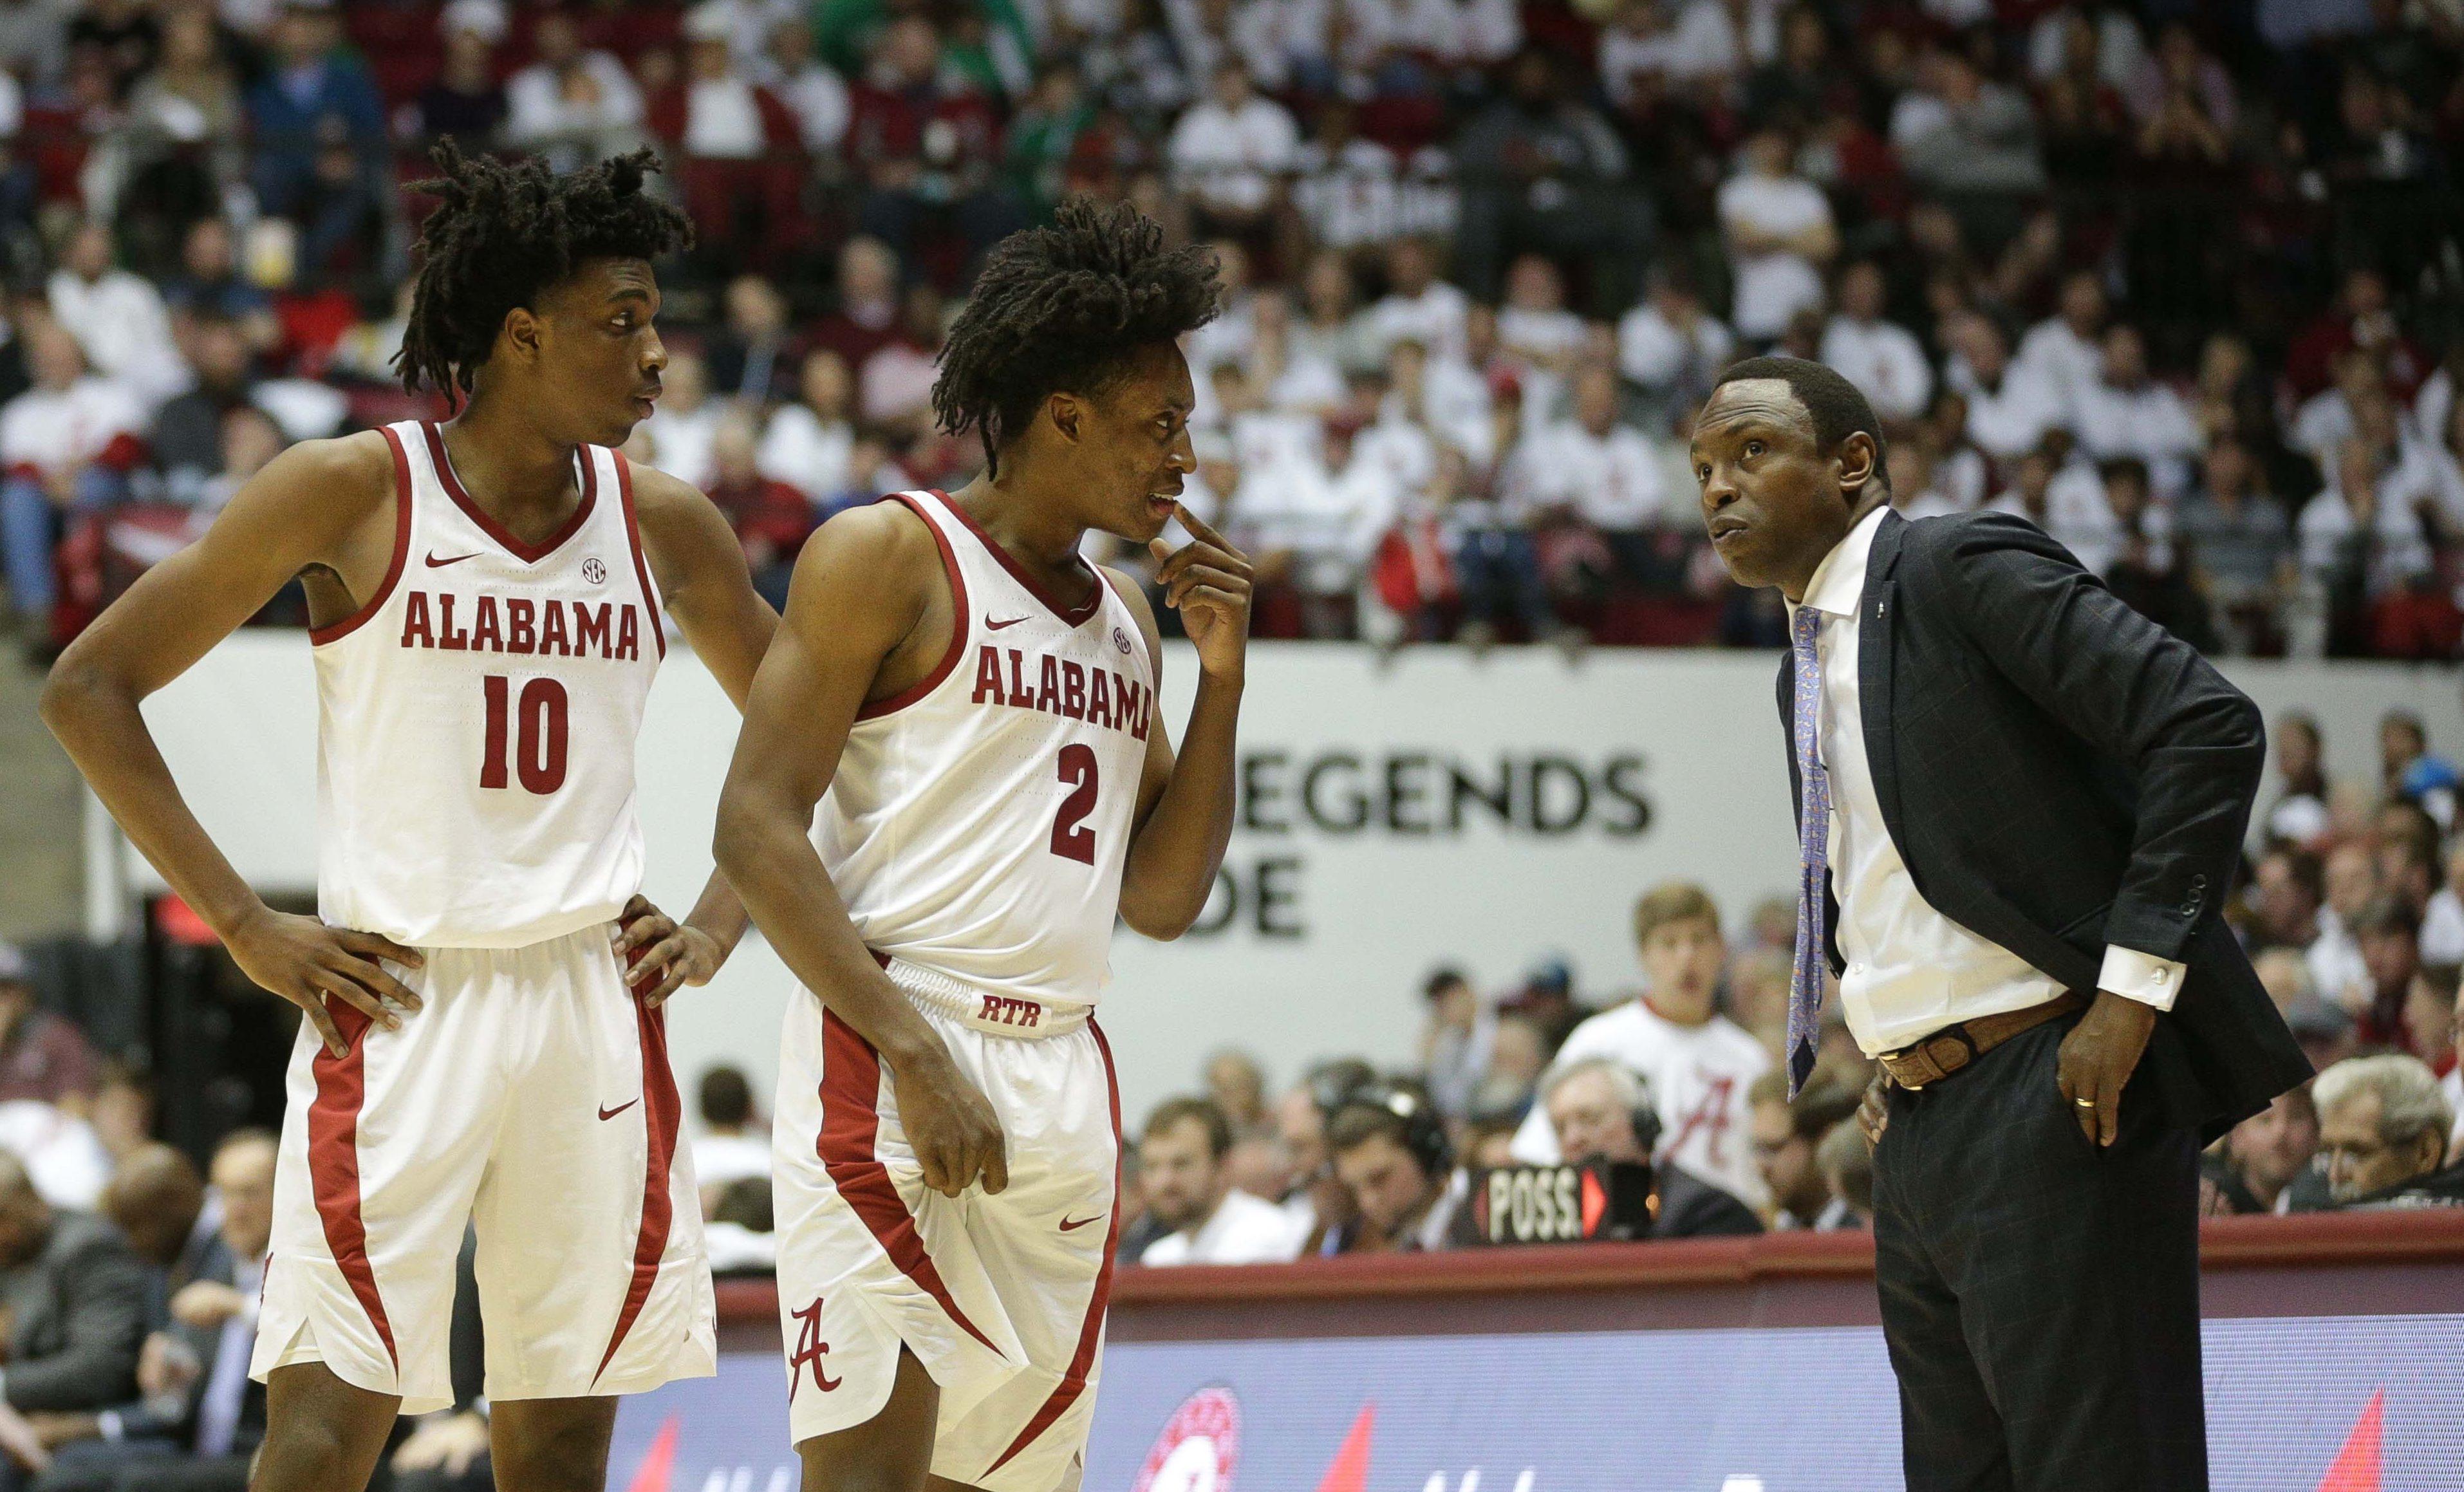 Avery Johnson's Alabama Looks to Make Big Leap in Upcoming Season ...